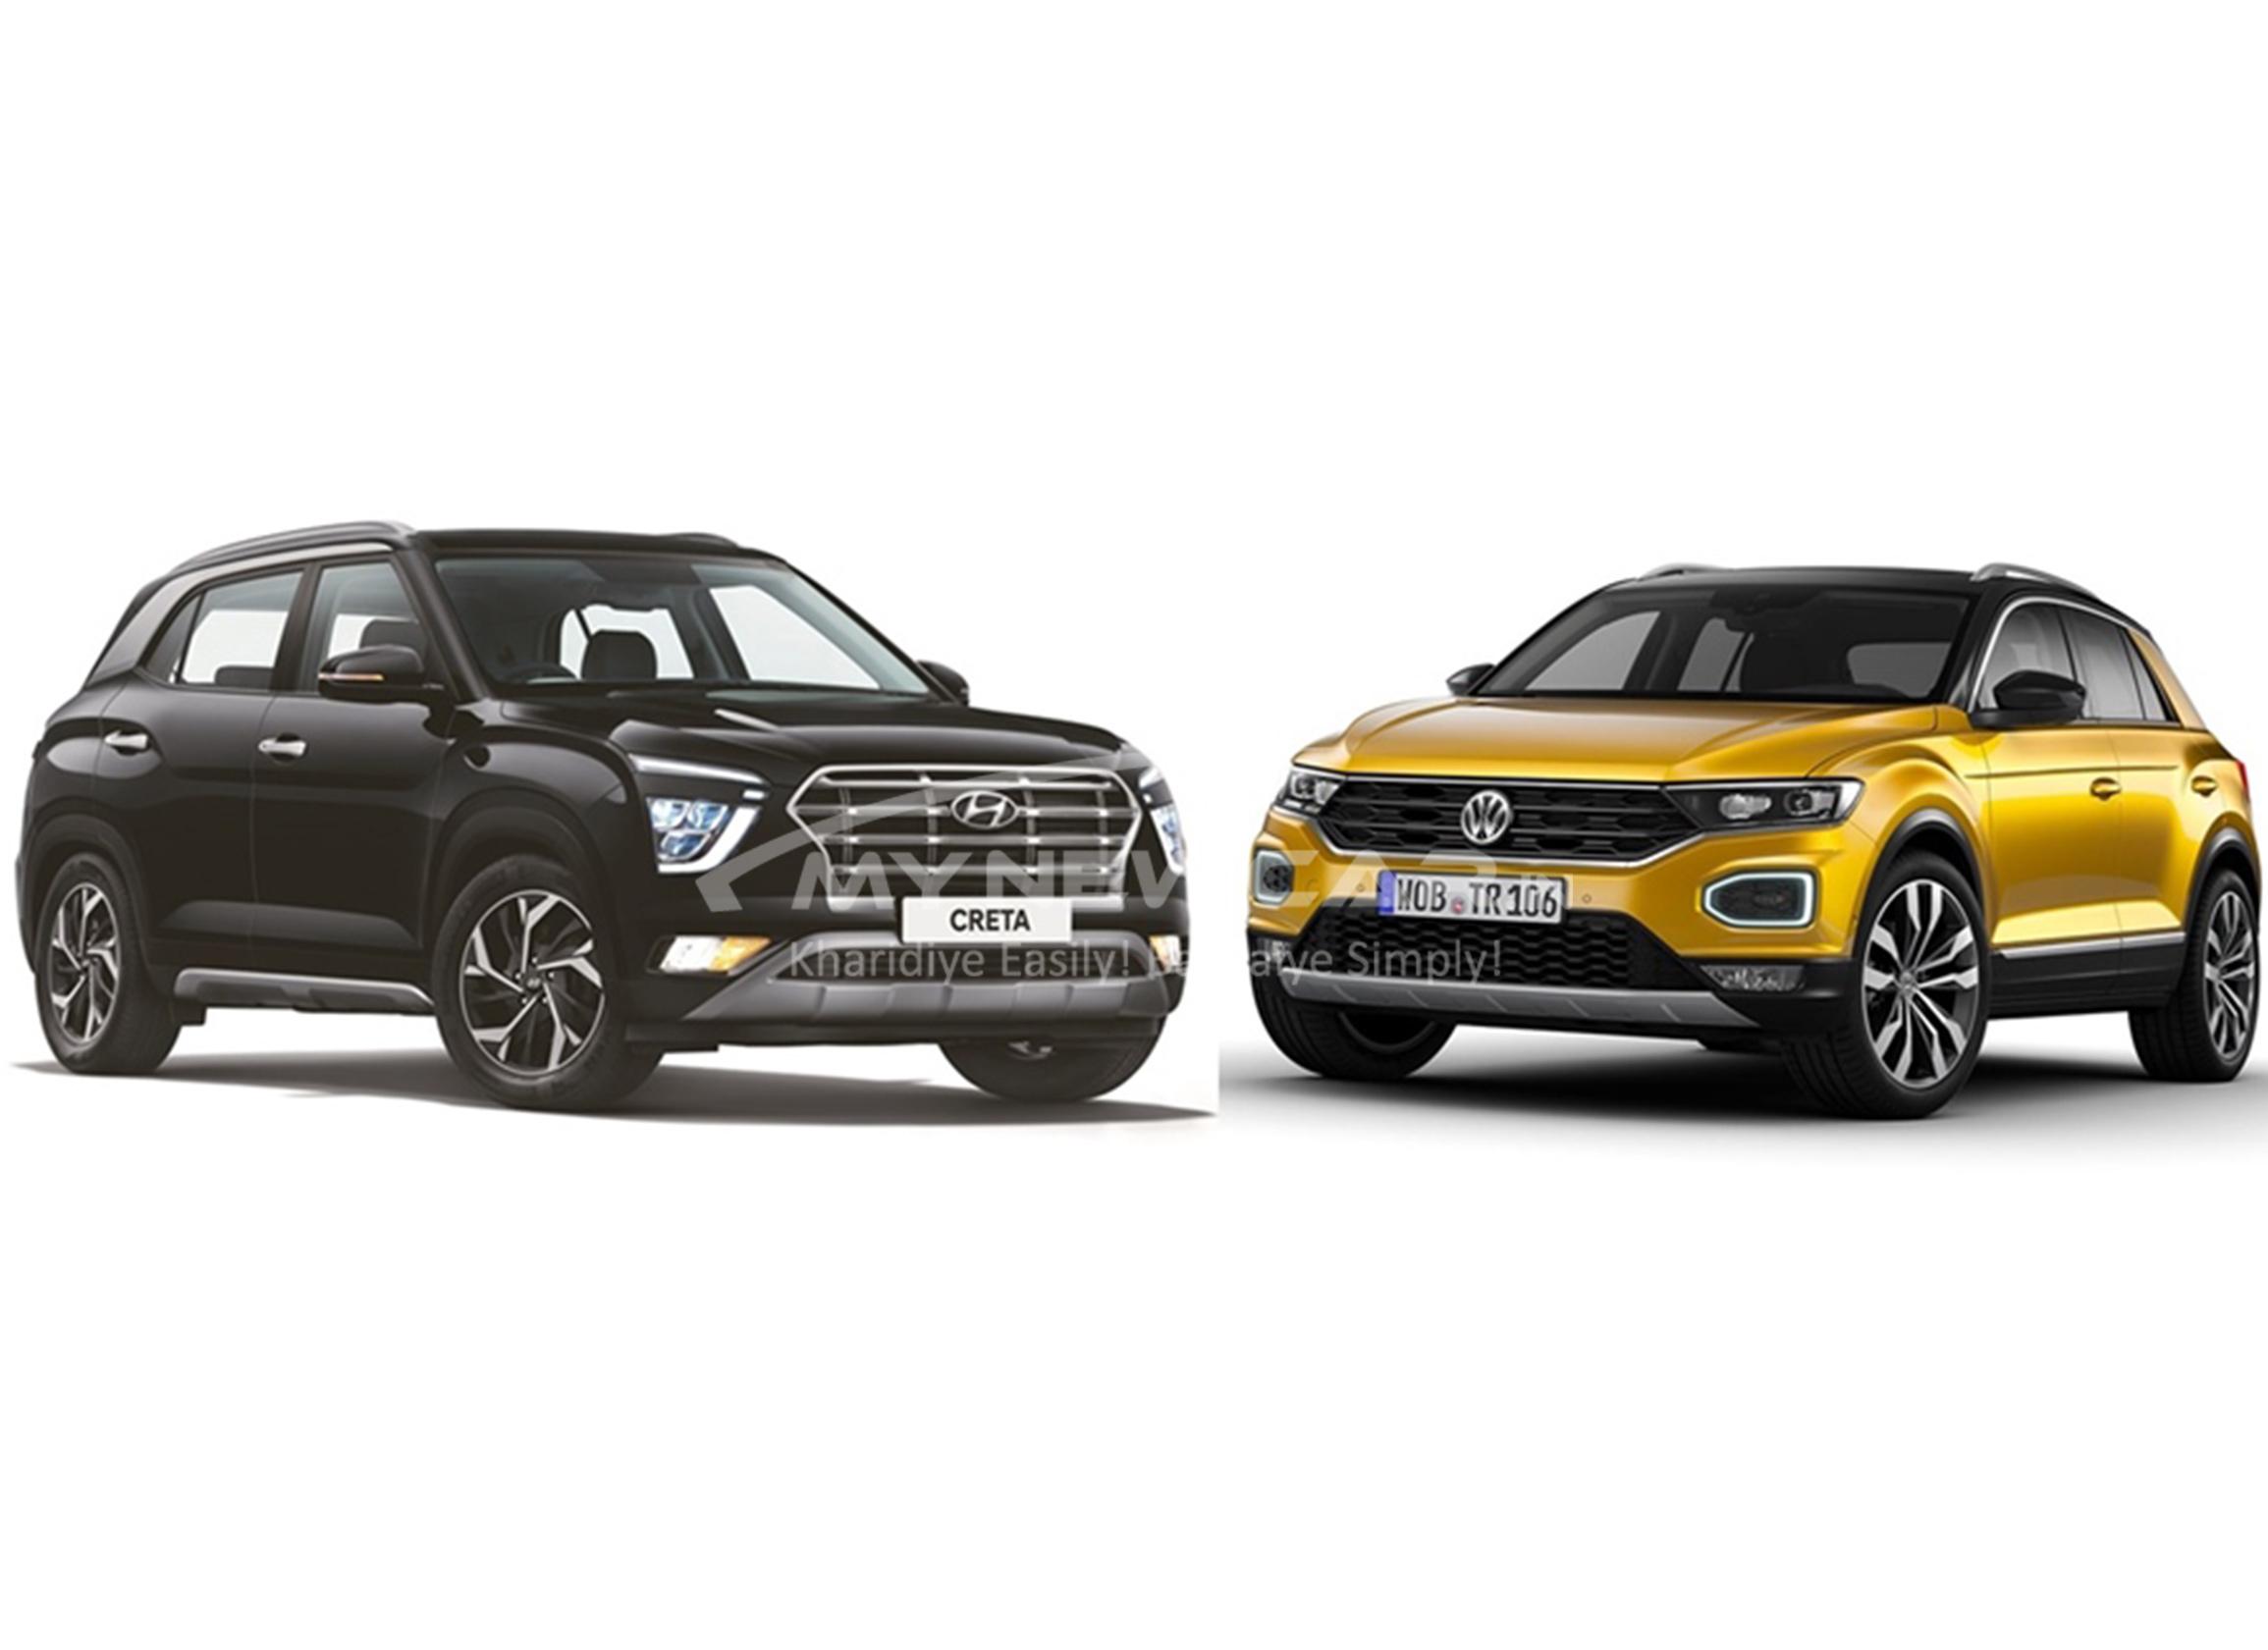 New Hyundai Creta vs Volkswagen T-roc image